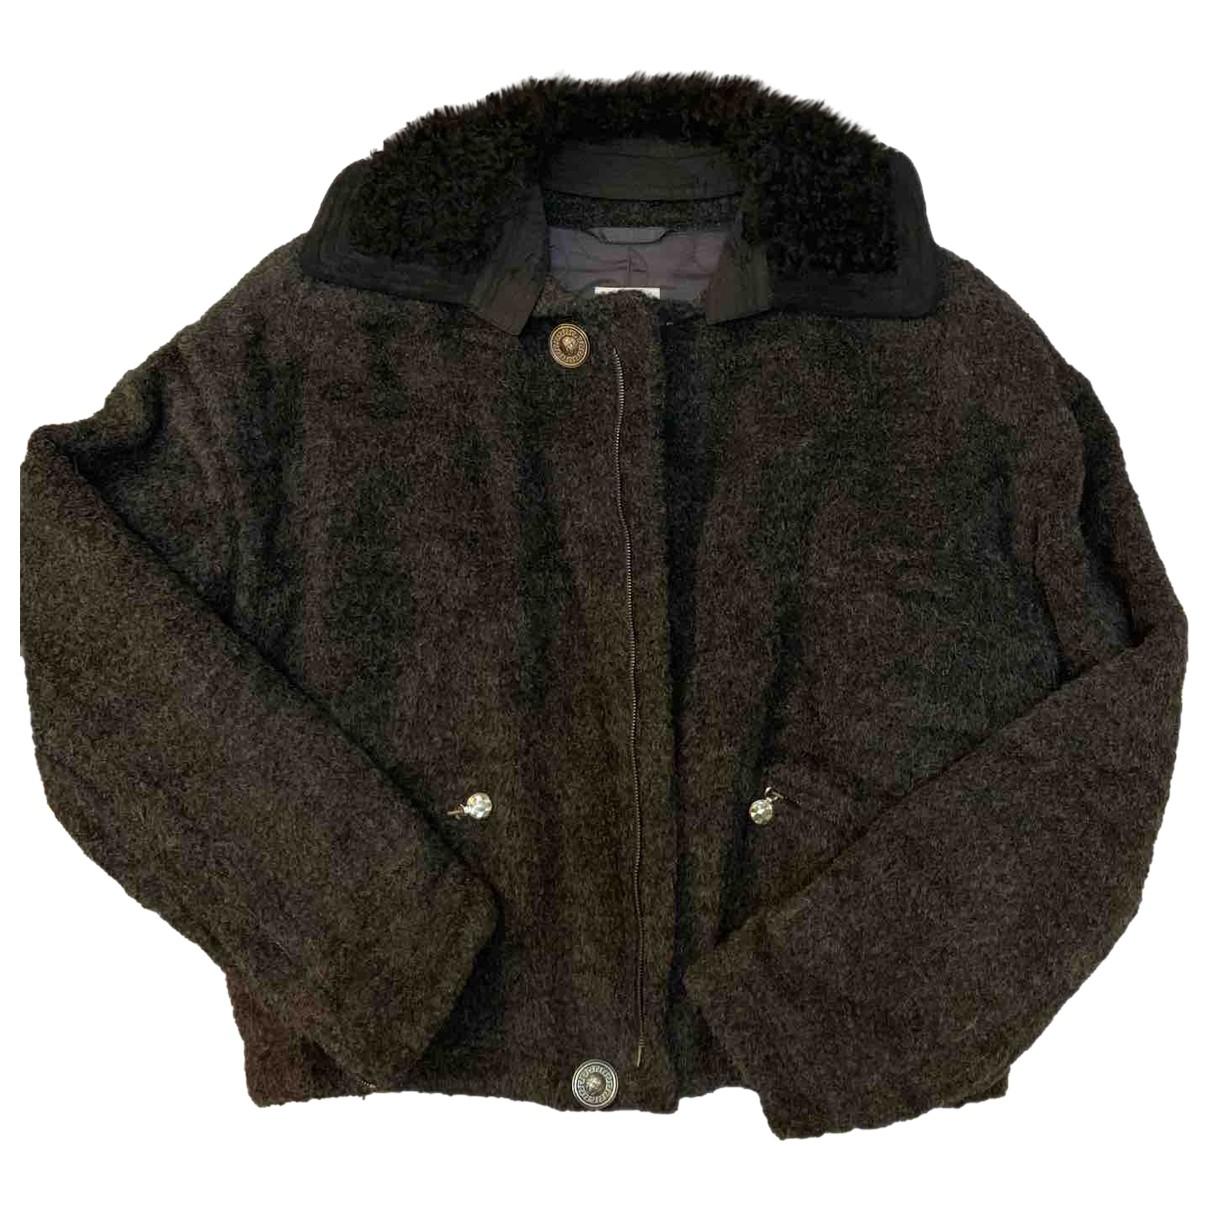 Gianni Versace \N Jacke in  Grau Wolle